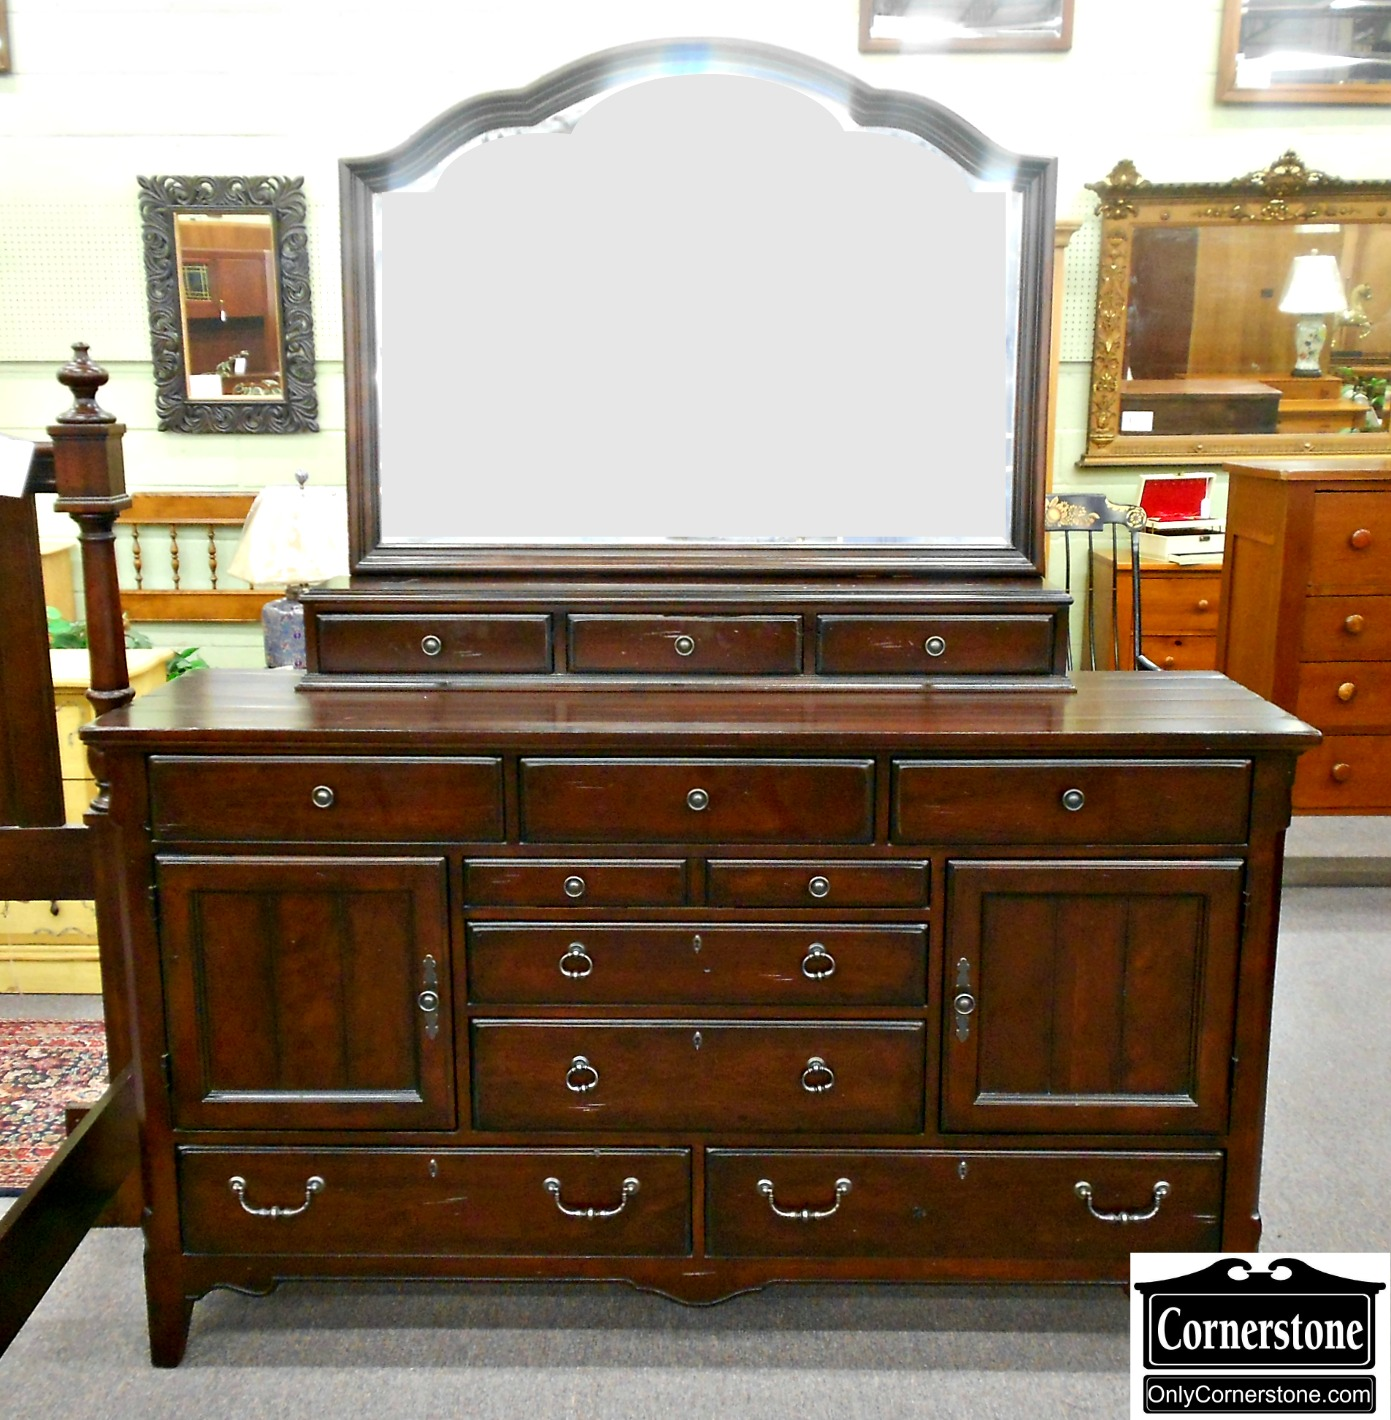 bed baltimore maryland furniture store cornerstone. Black Bedroom Furniture Sets. Home Design Ideas